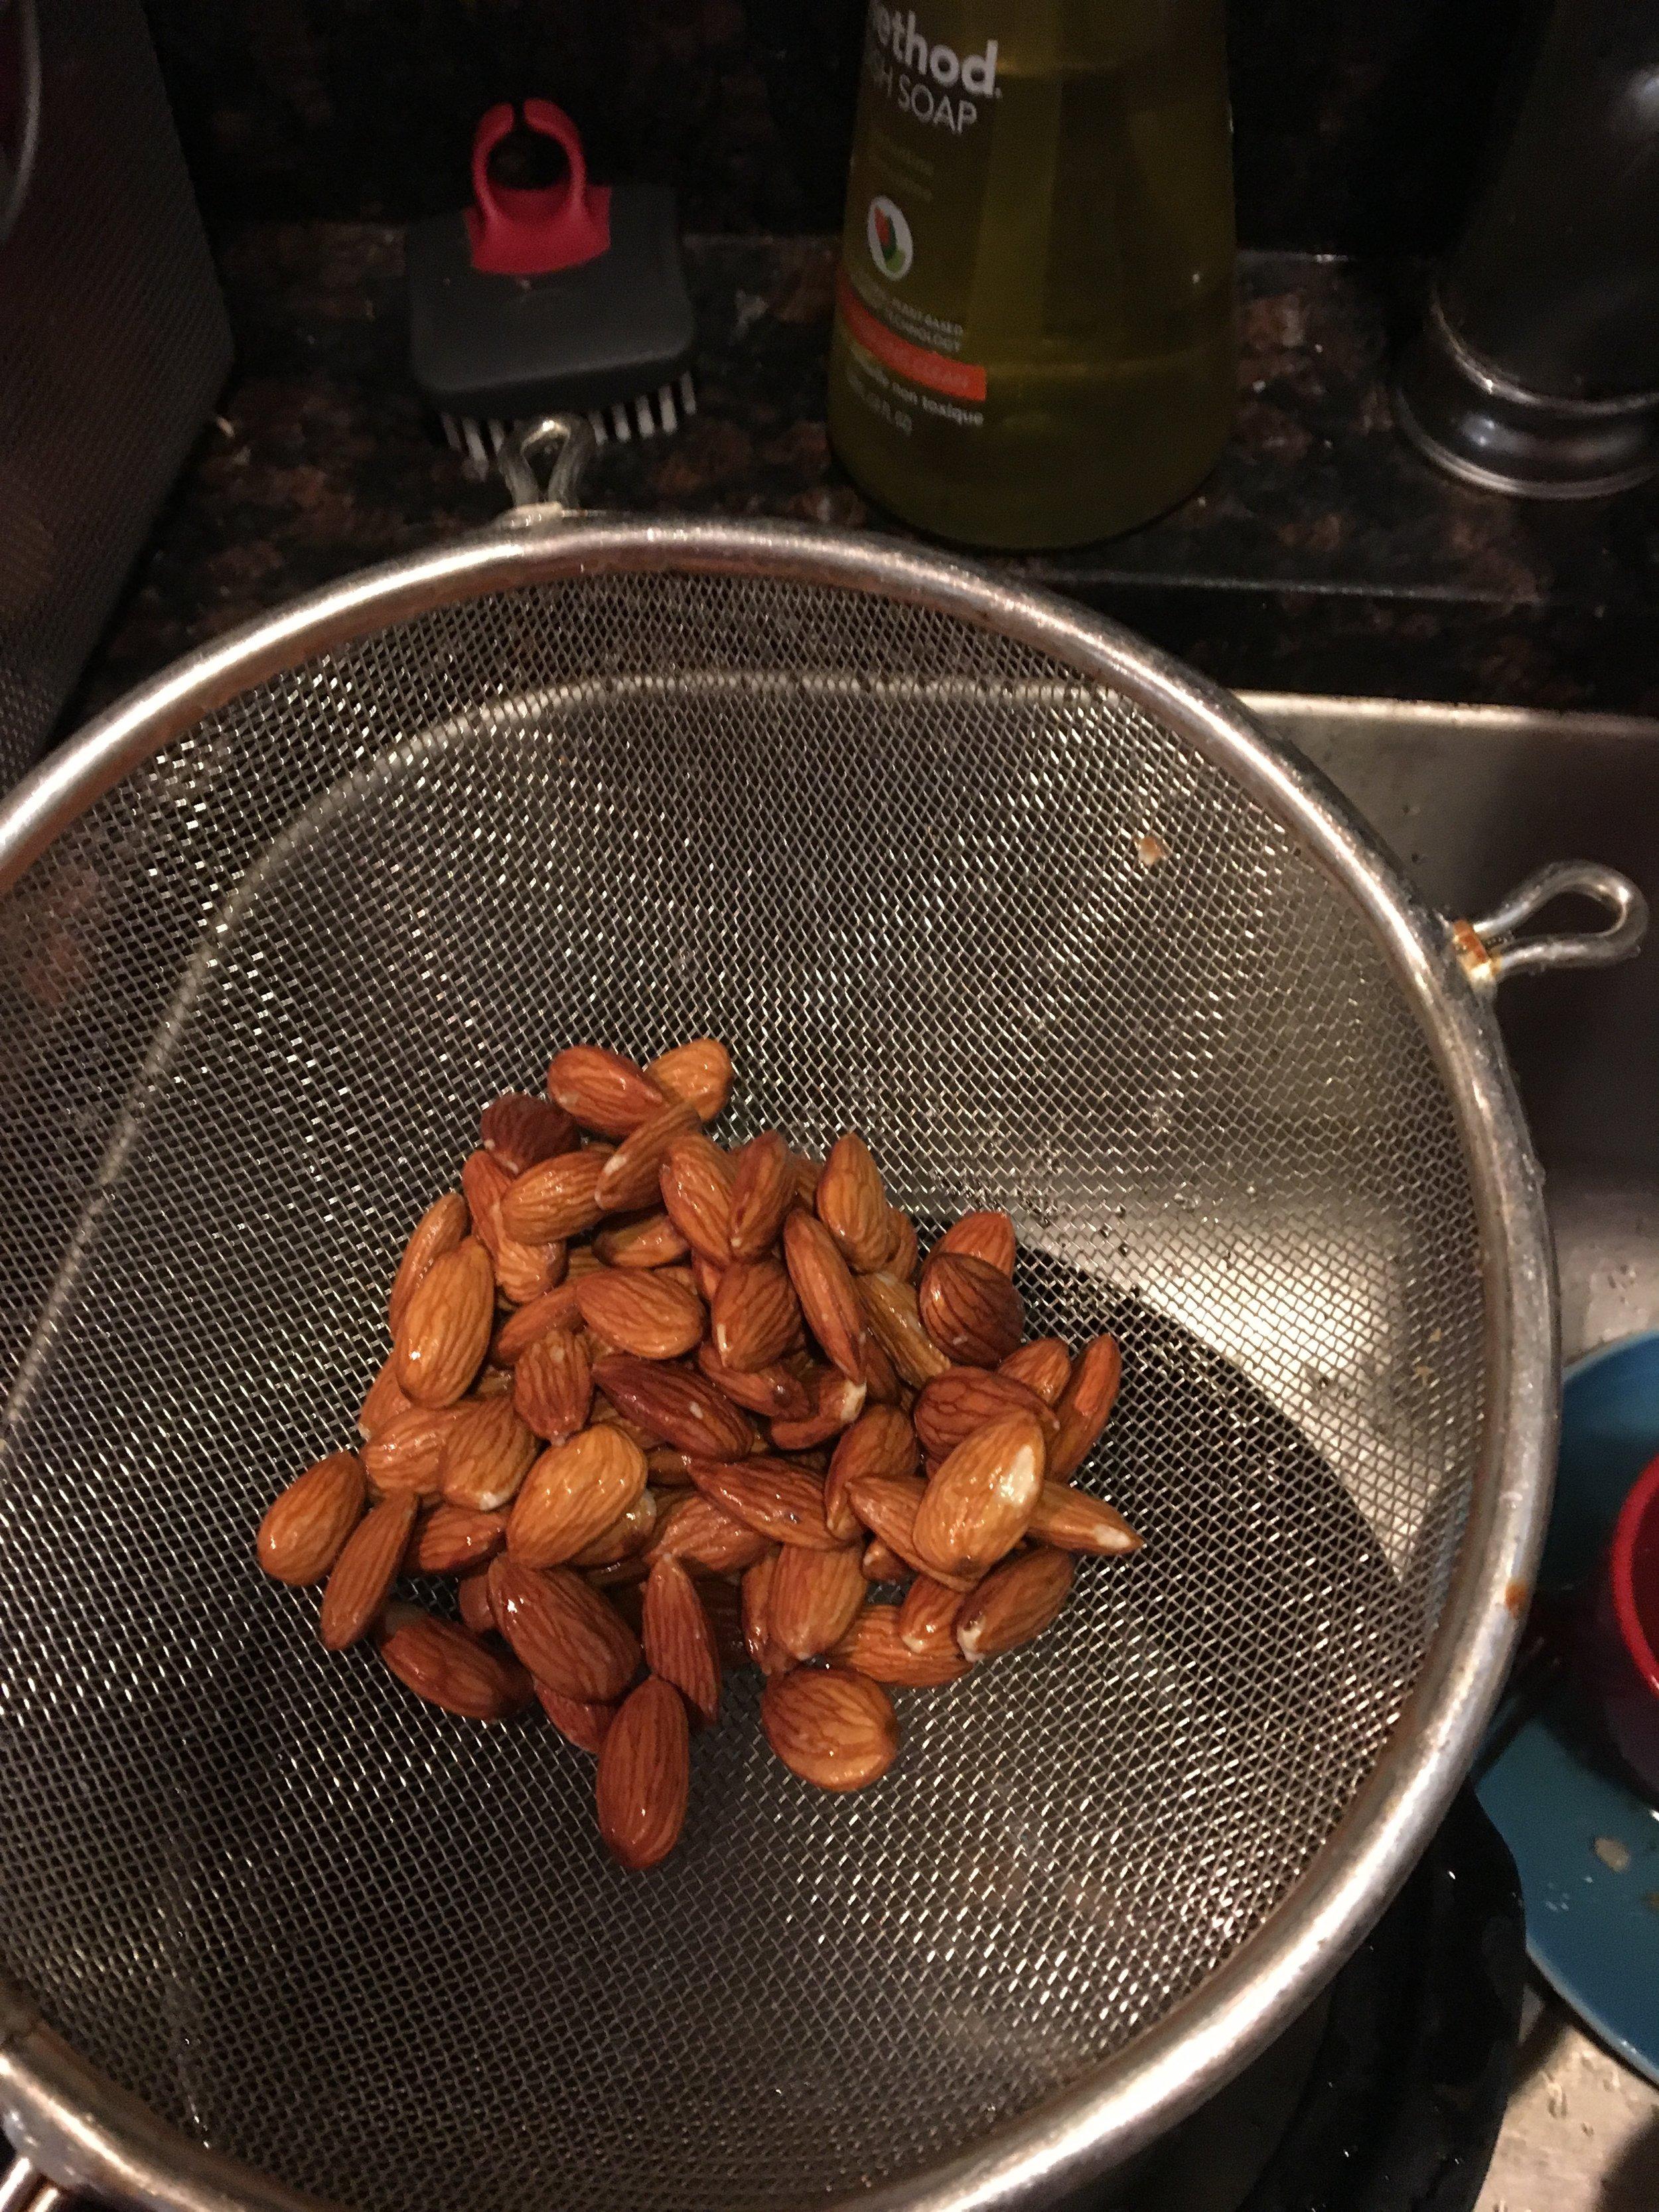 Basket o nuts